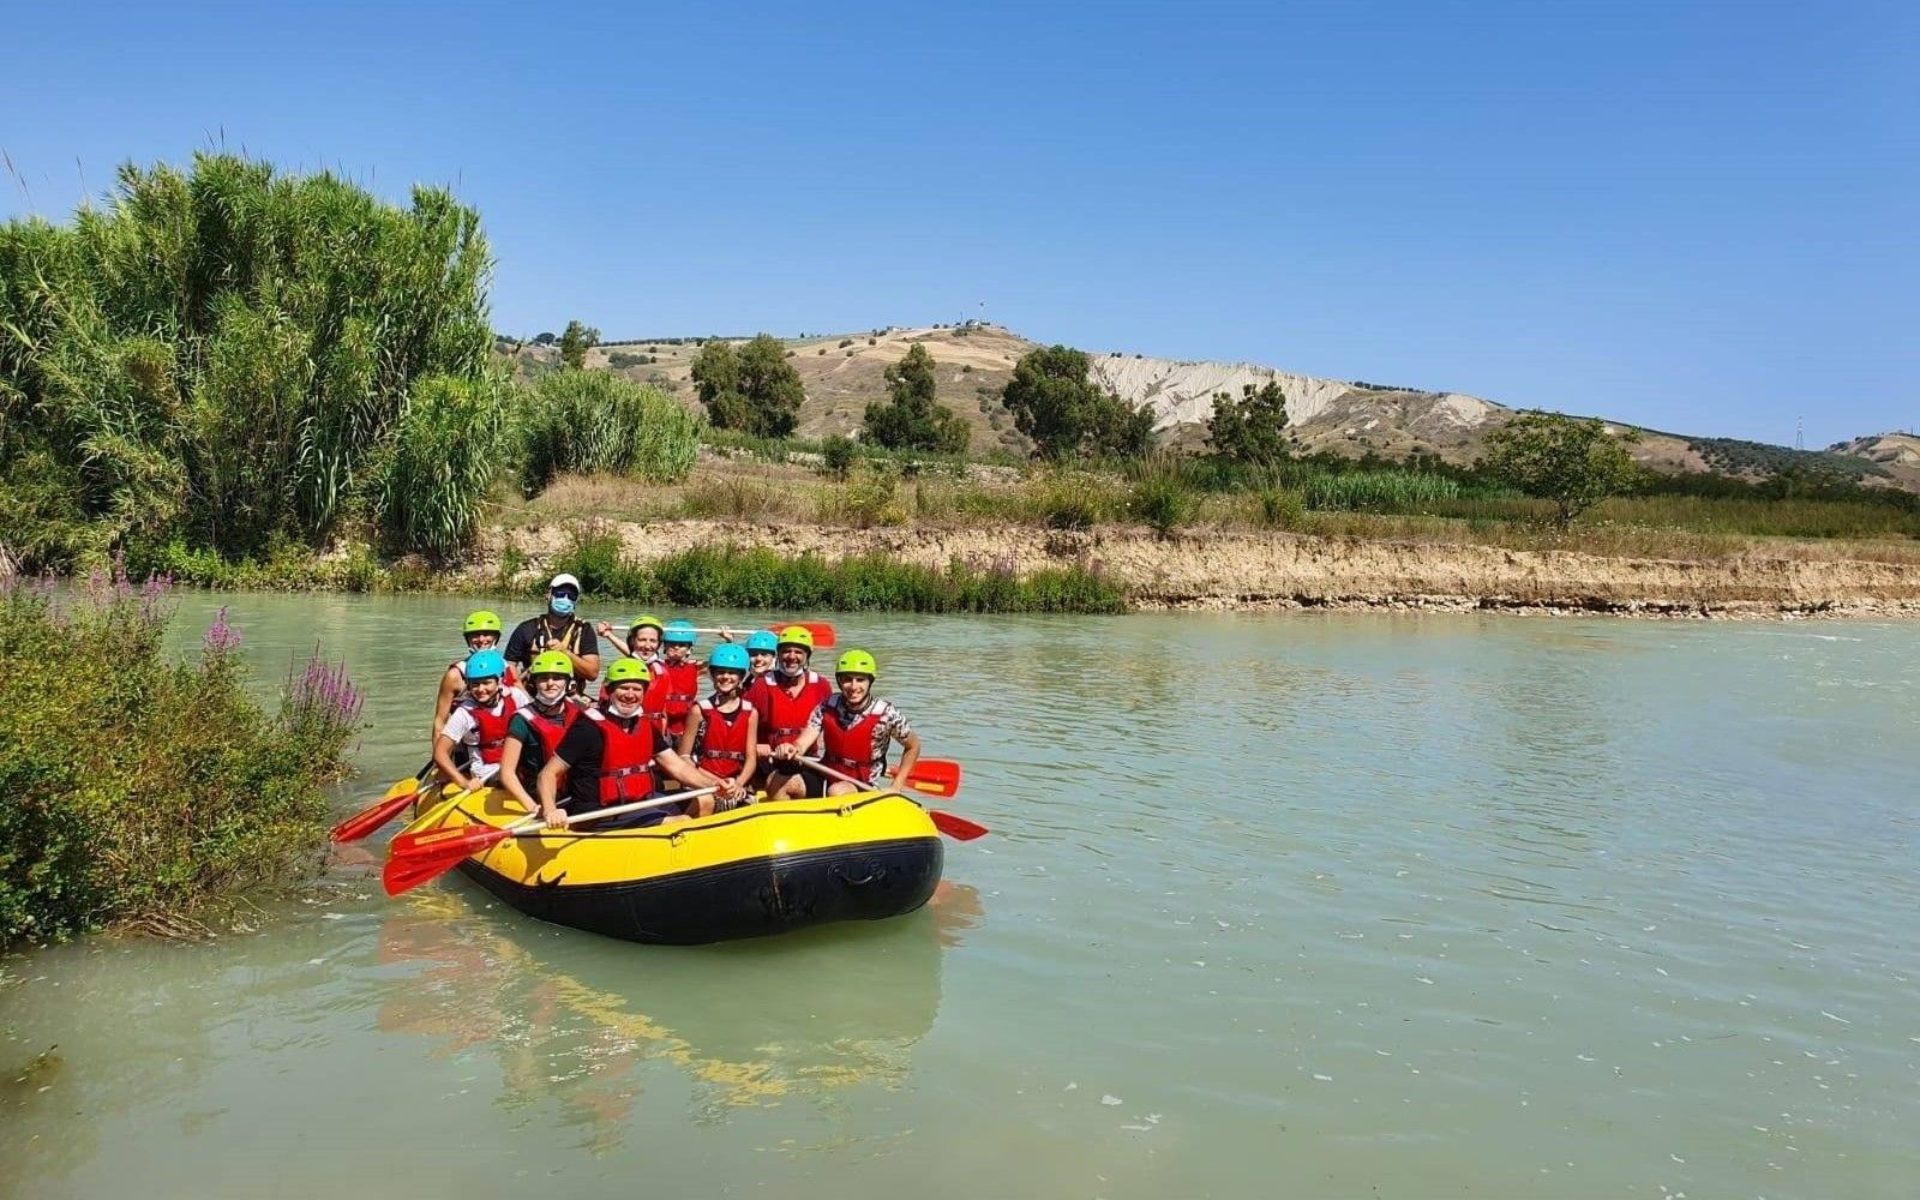 Rafting Fara San Martino